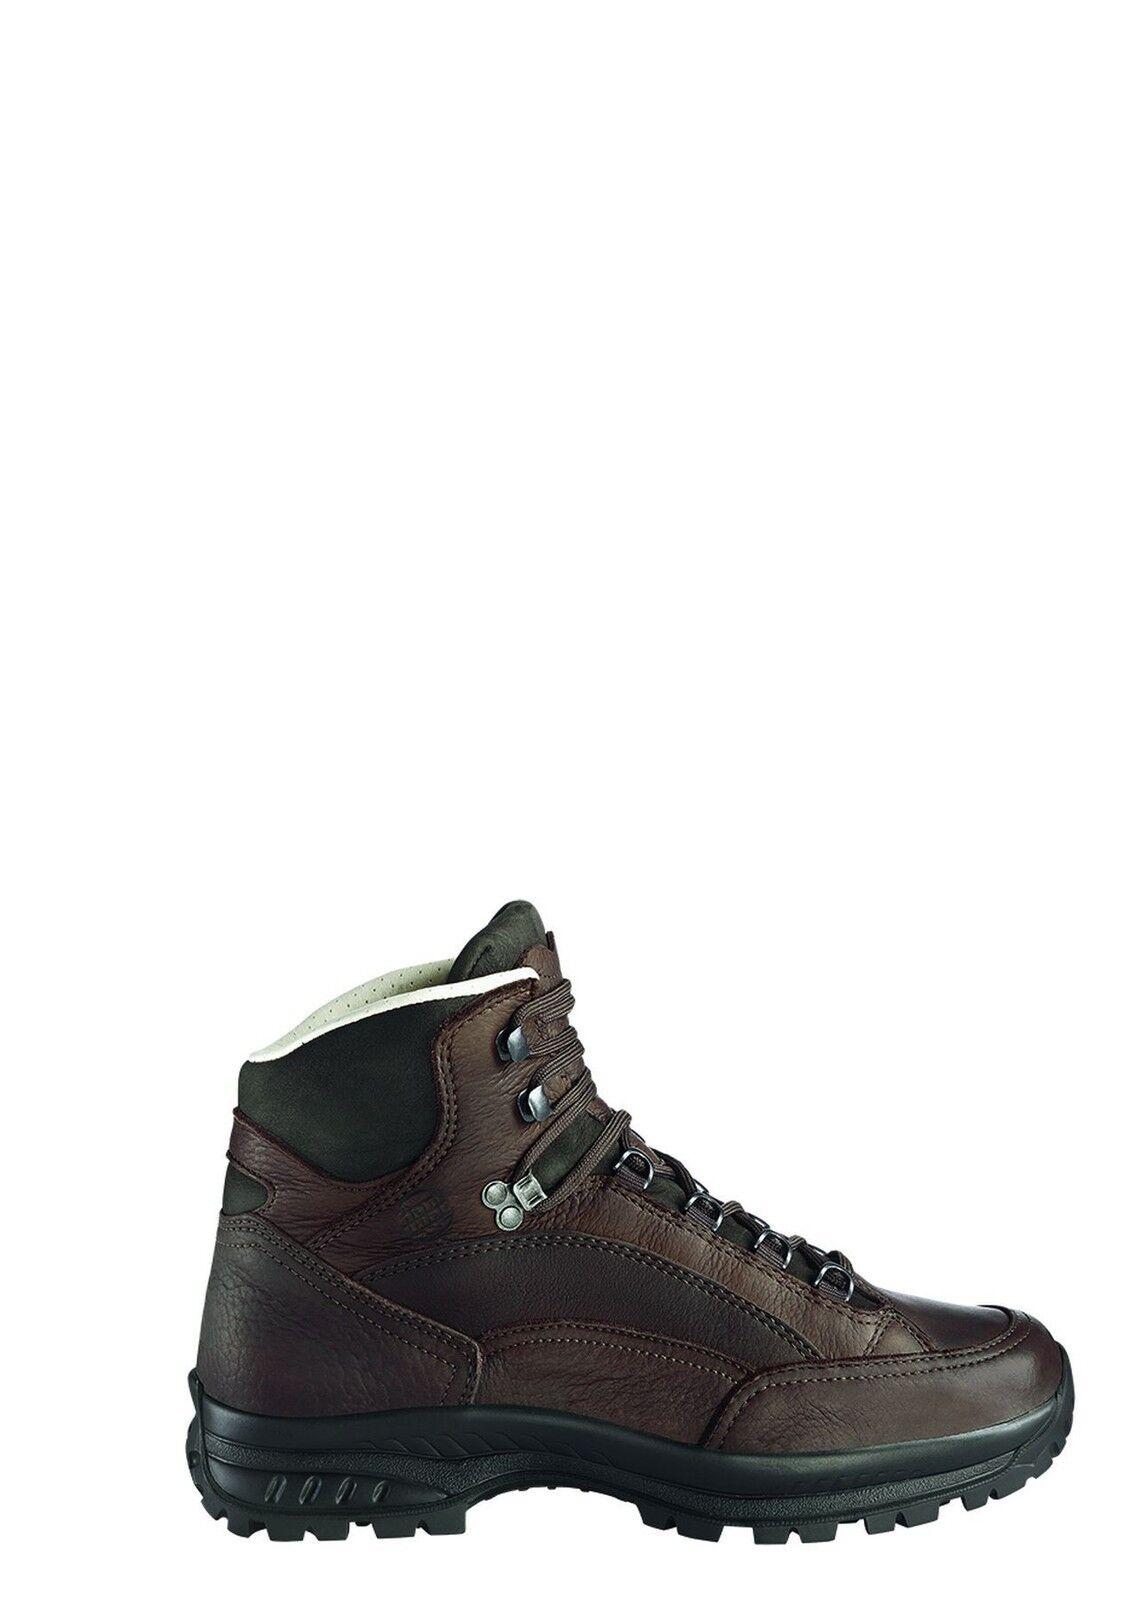 Hanwag trekking yak tingri zapatos talla 9,5 -  44 Marone